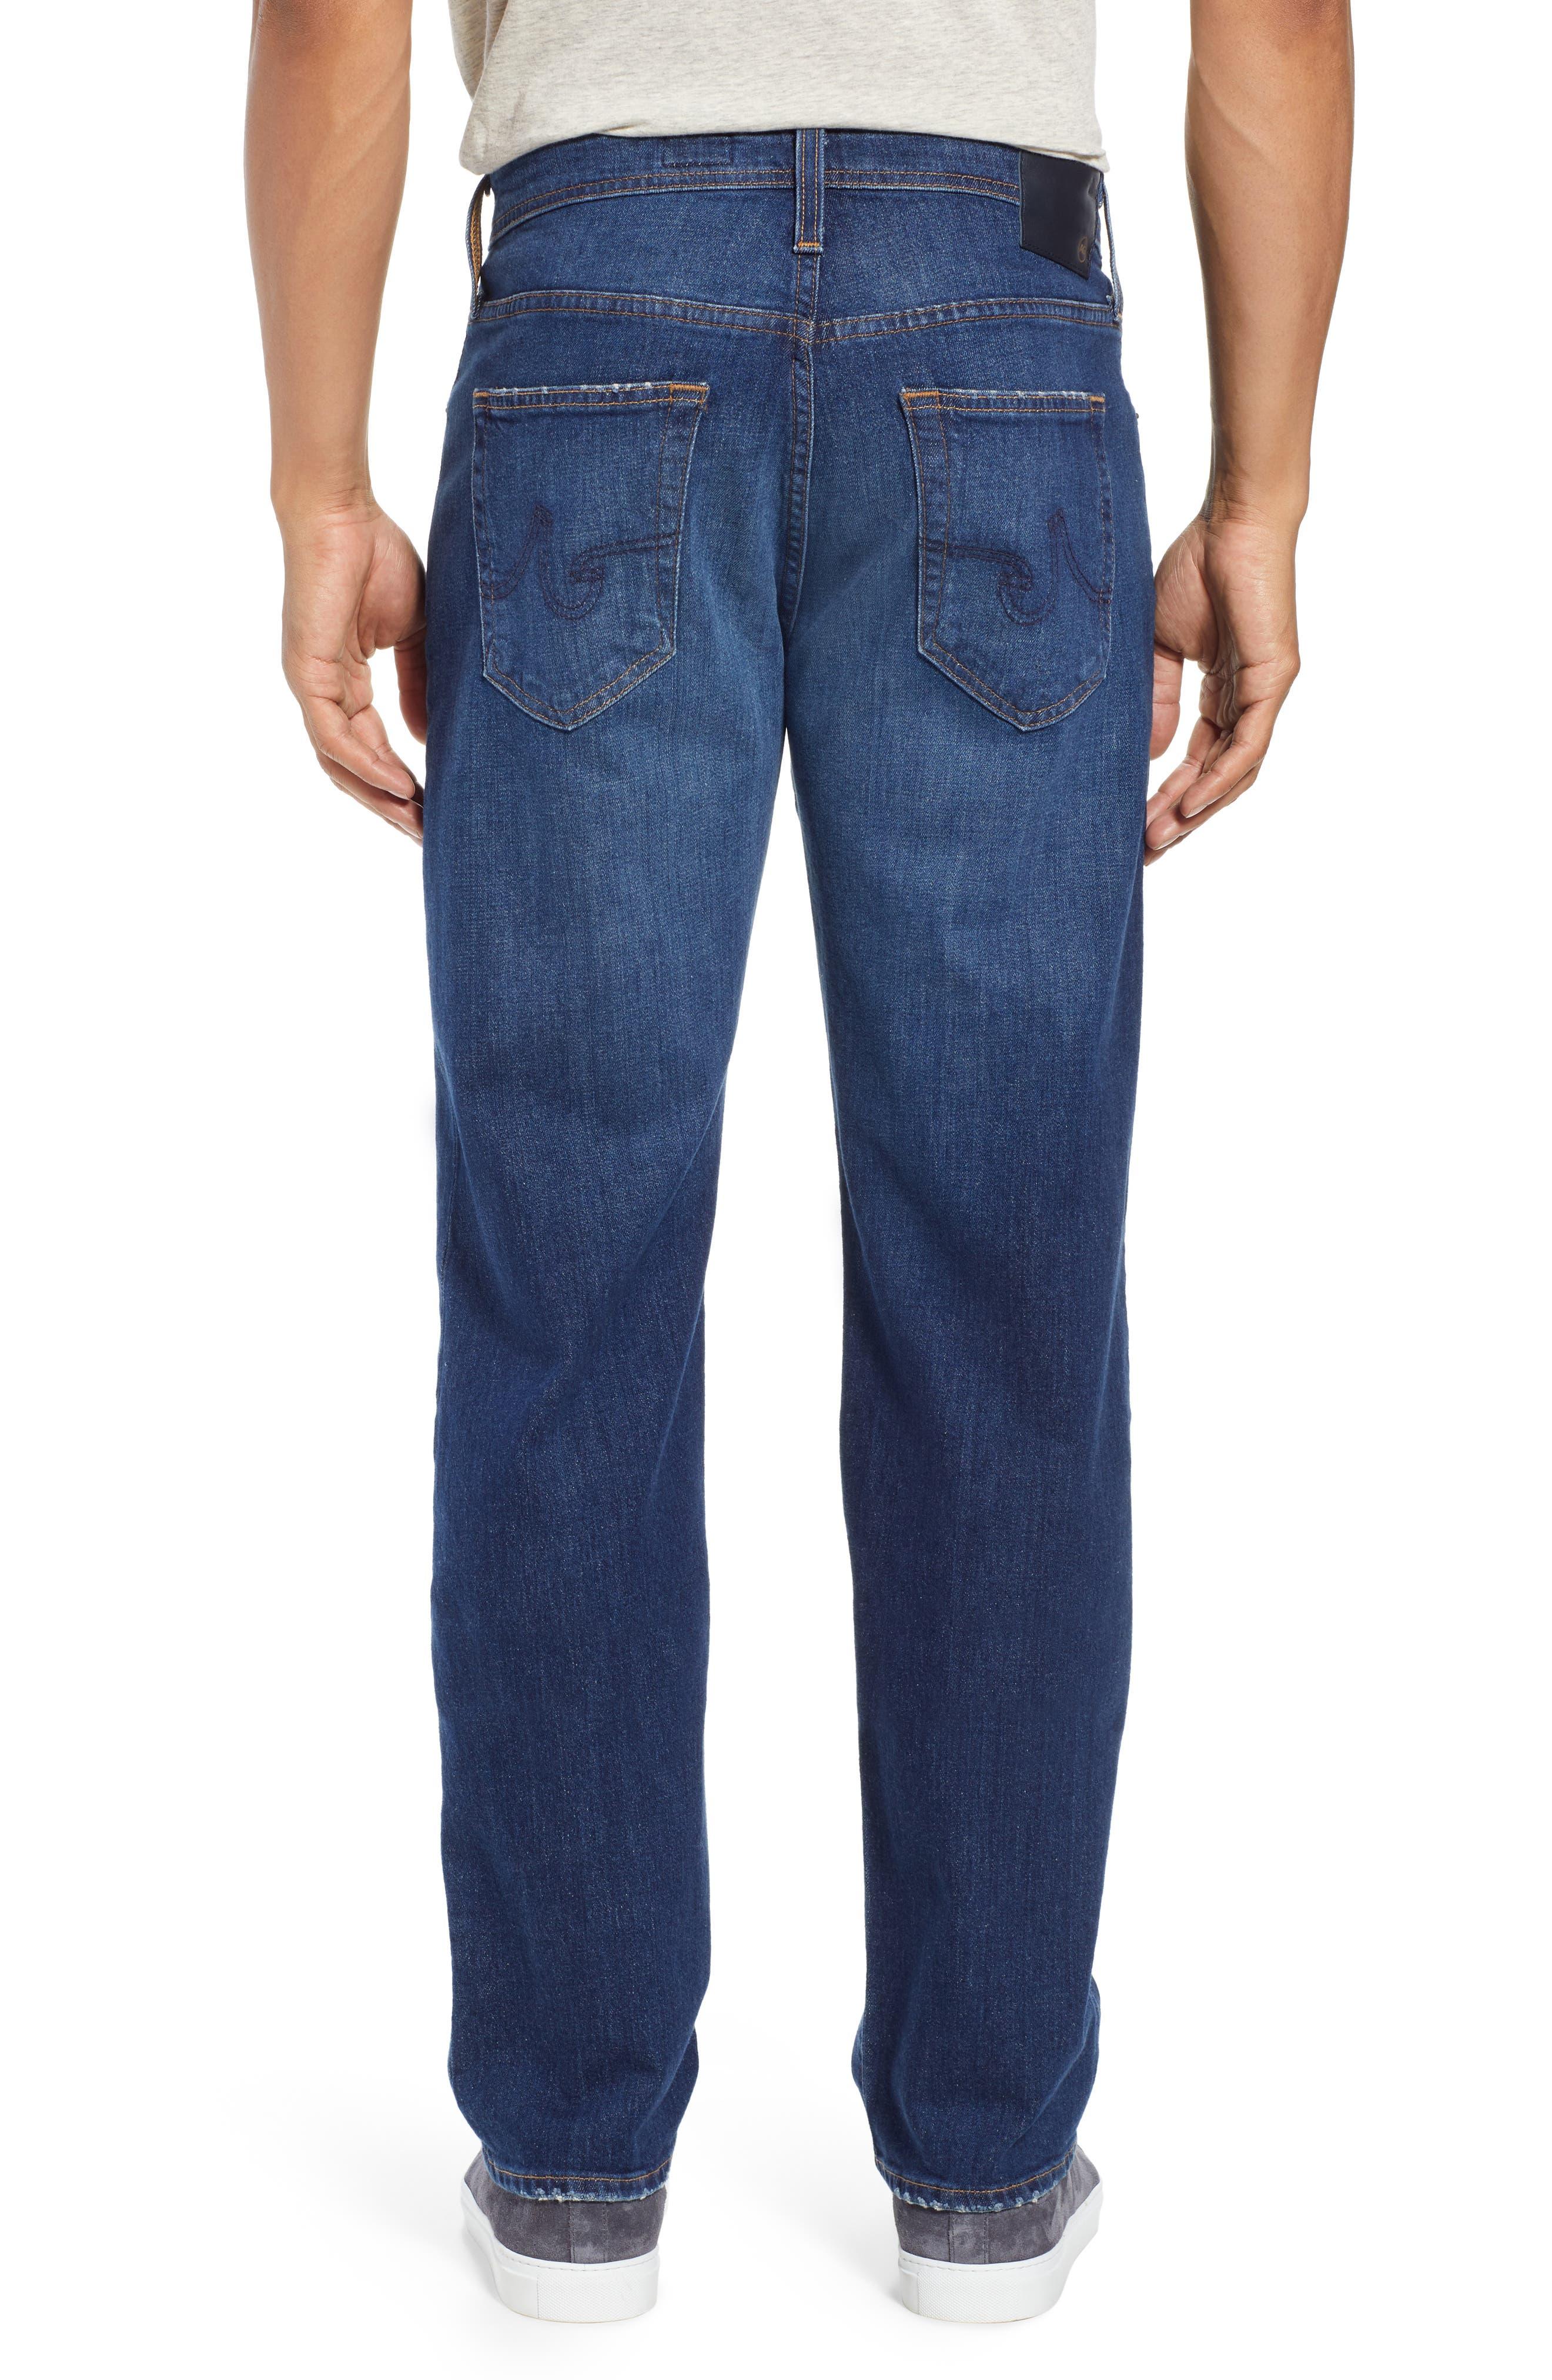 Graduate Slim Straight Leg Jeans,                             Alternate thumbnail 2, color,                             400